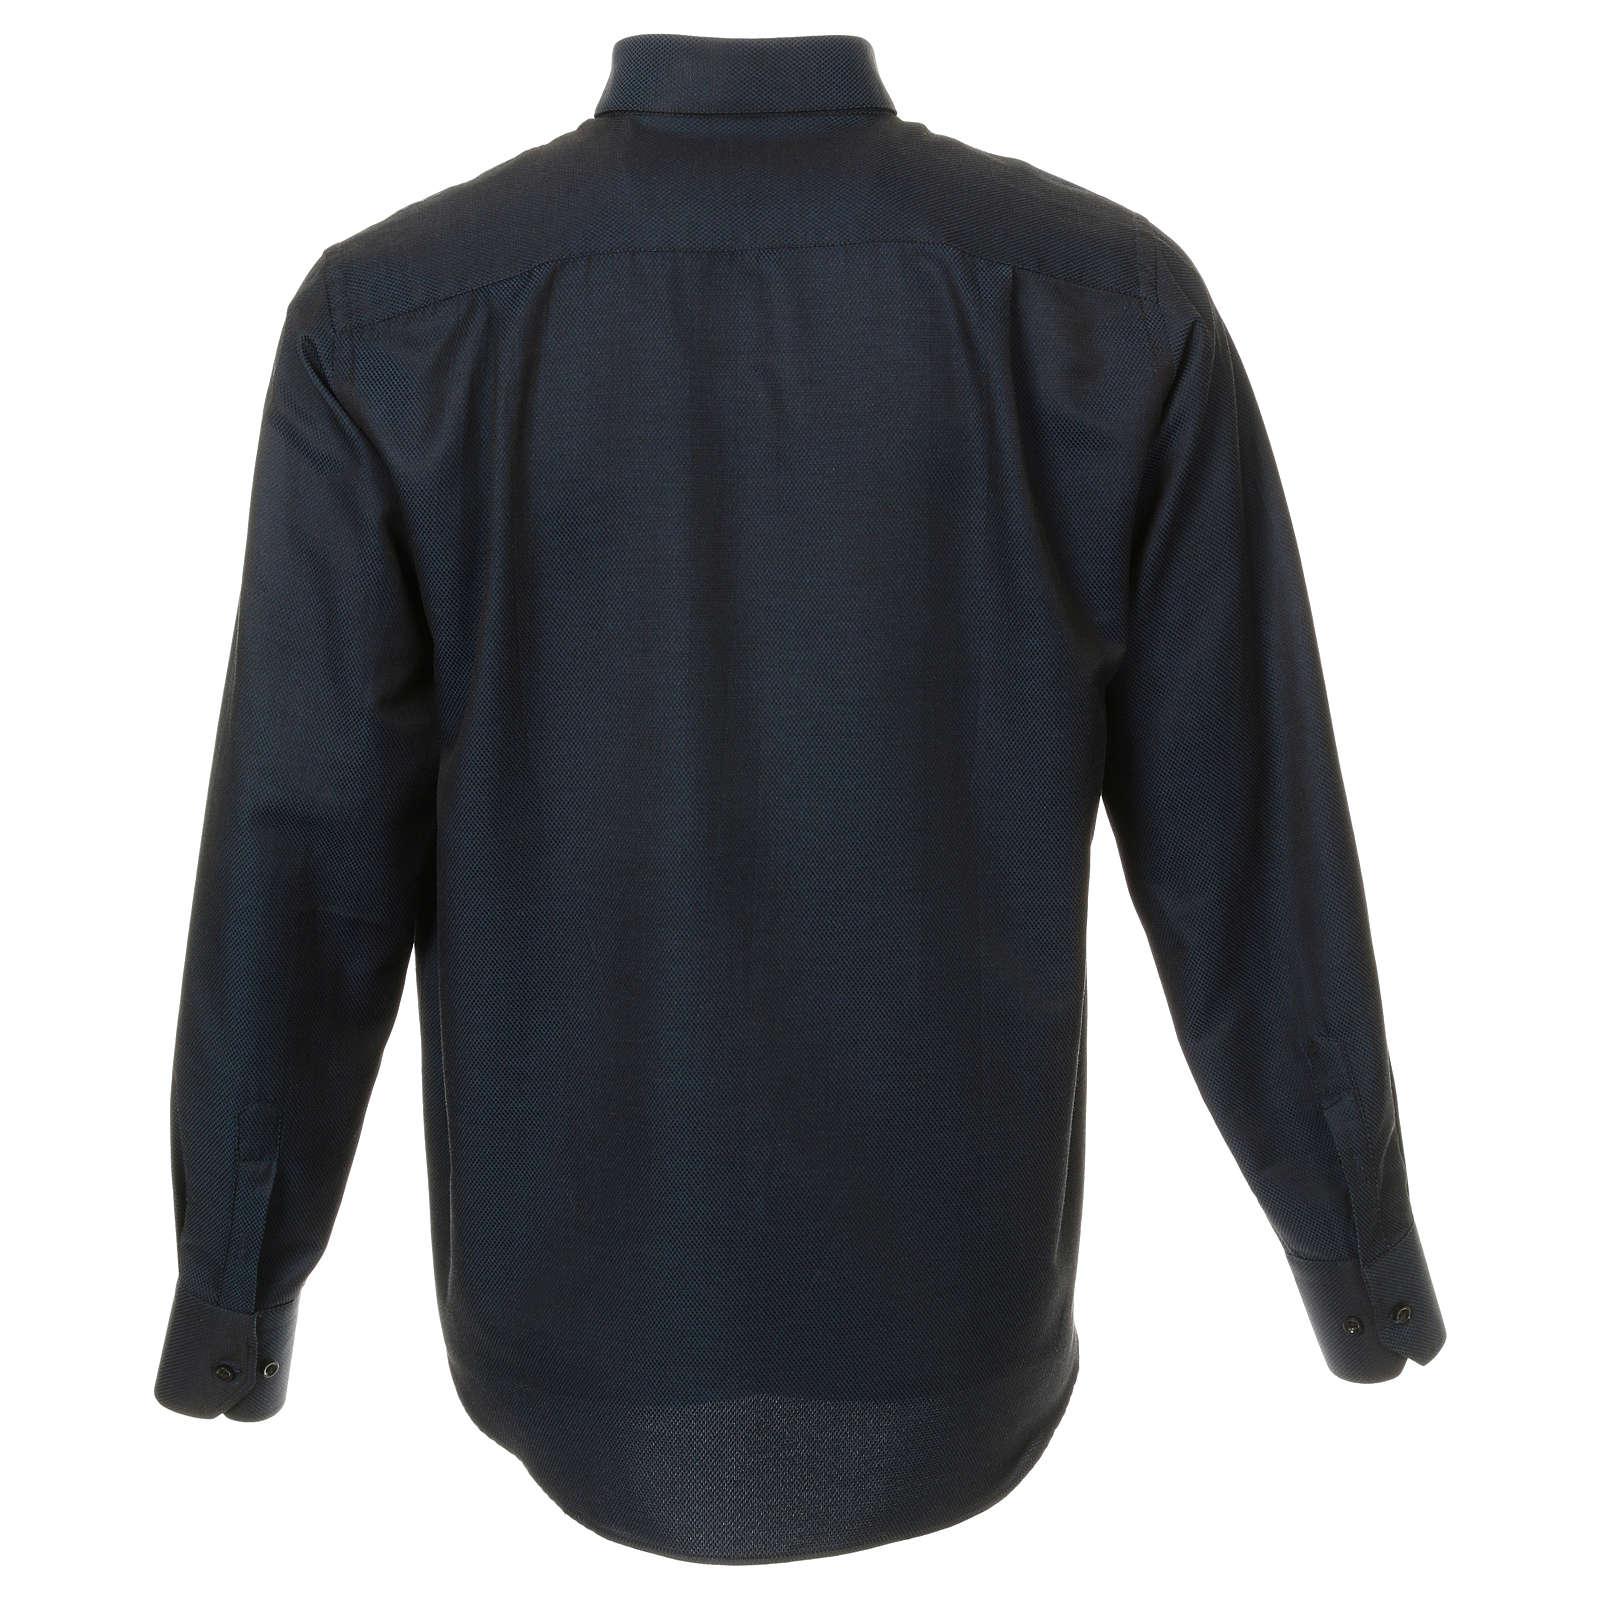 Camicia clergy in seta tessuto nido d'ape Blu M. Lunga 4